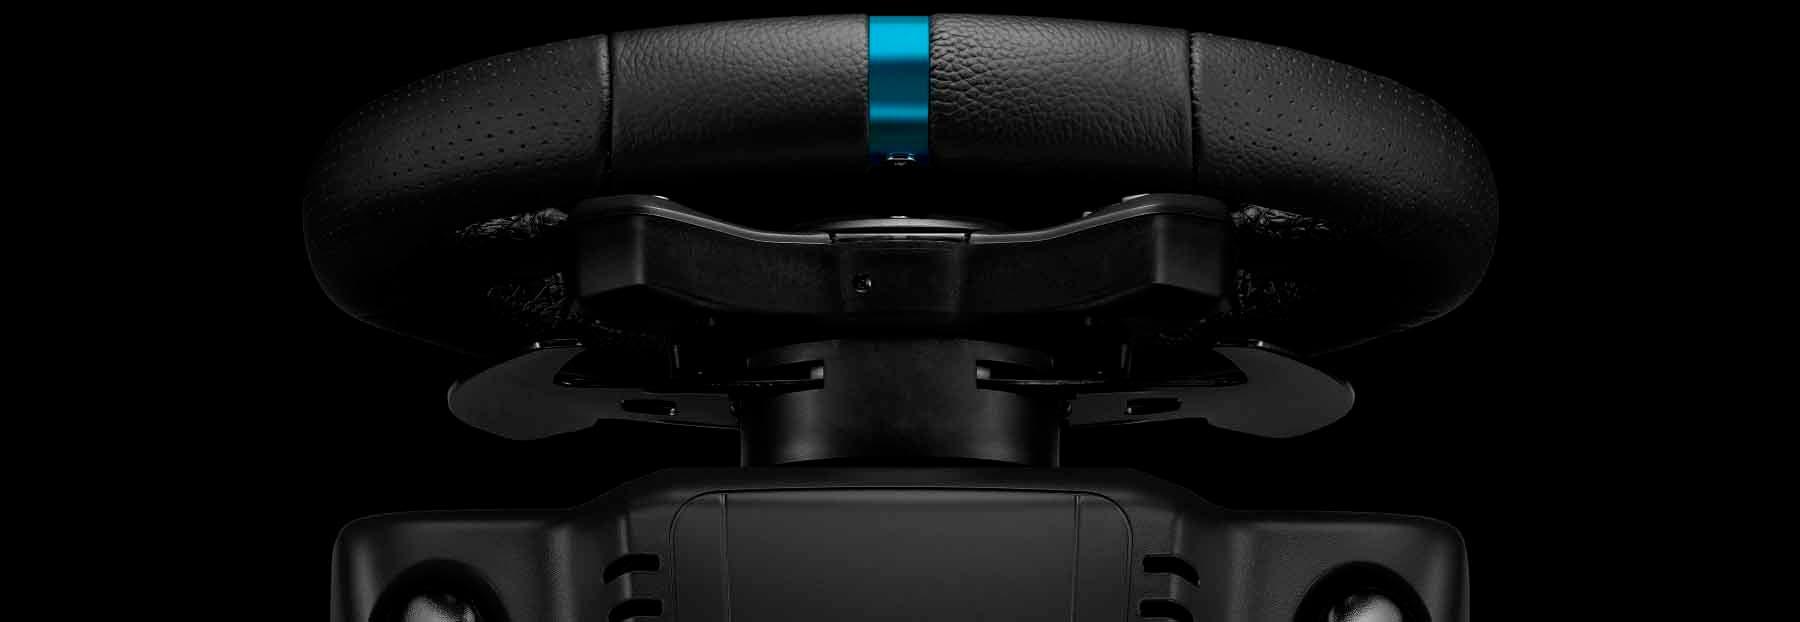 Análisis del Logitech G923 para Xbox One y PC 3